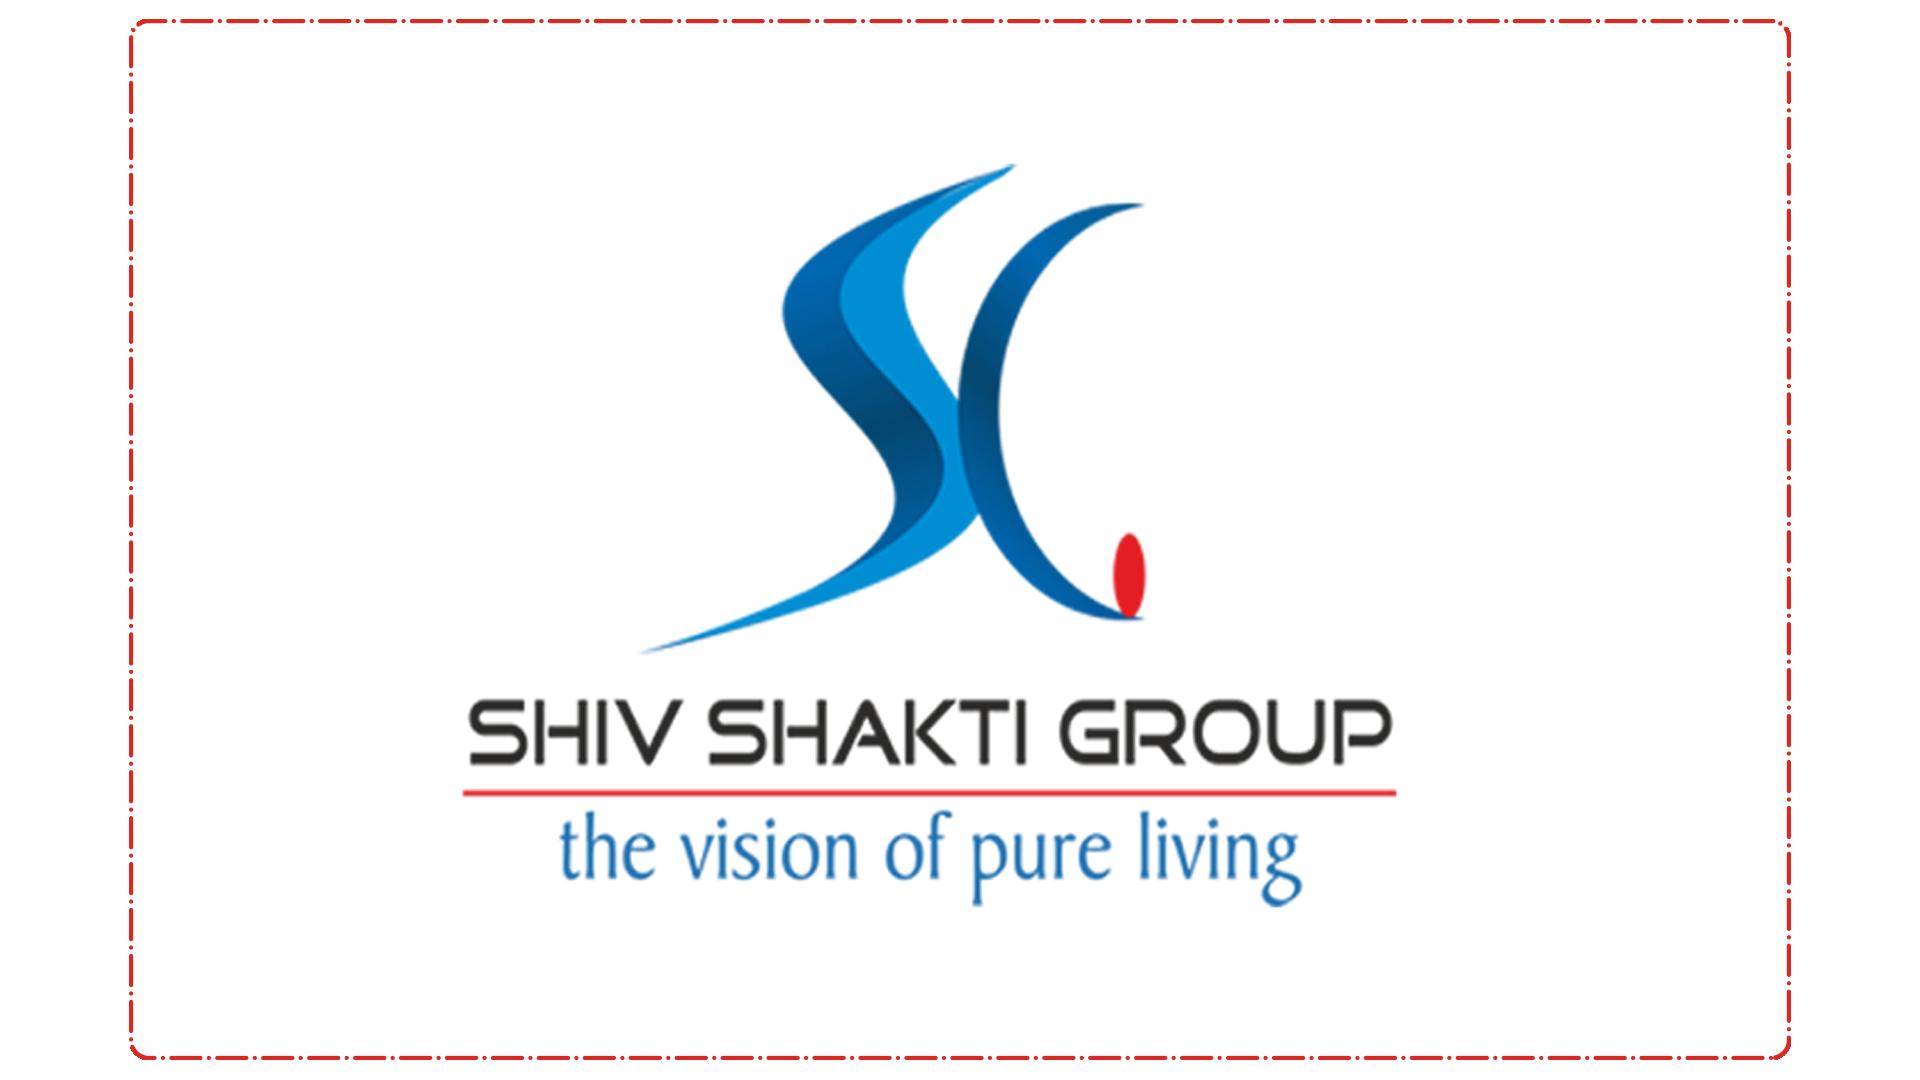 Shiv Shakti Group